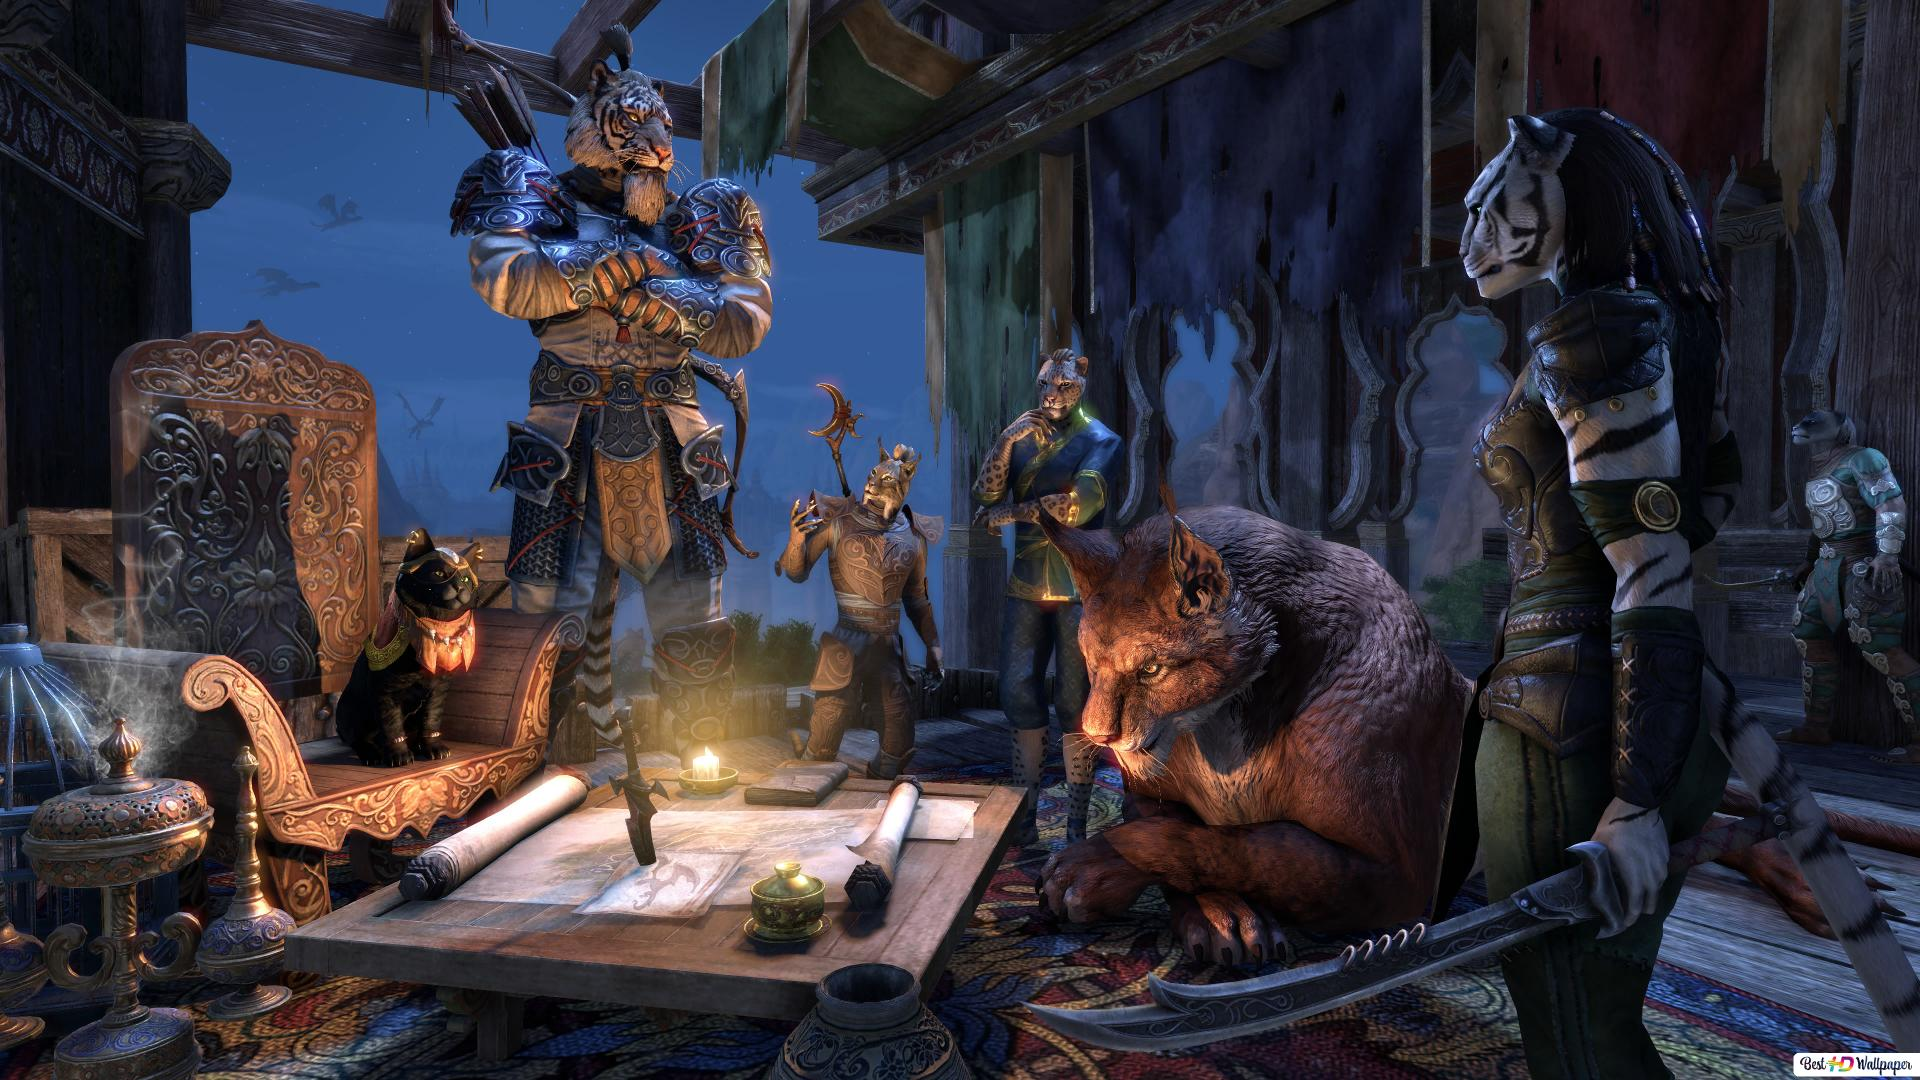 The Elder Scrolls Online Hd Wallpaper Download